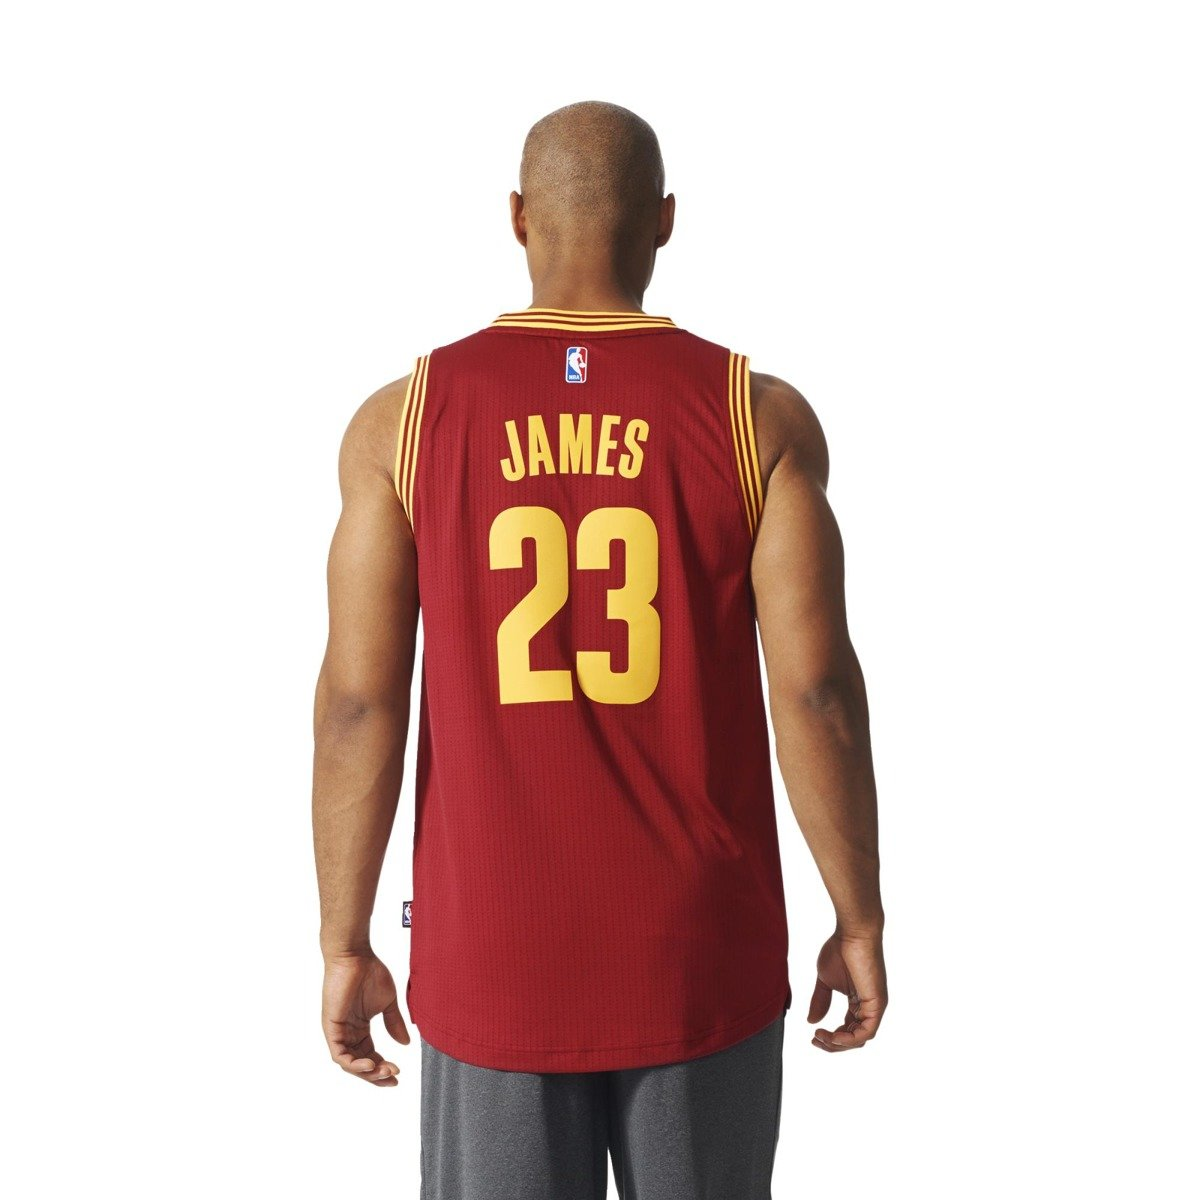 587b8e29ca3 ... Adidas NBA Swingman Cleveland Cavaliers LeBron James Jersey - A61199 ...